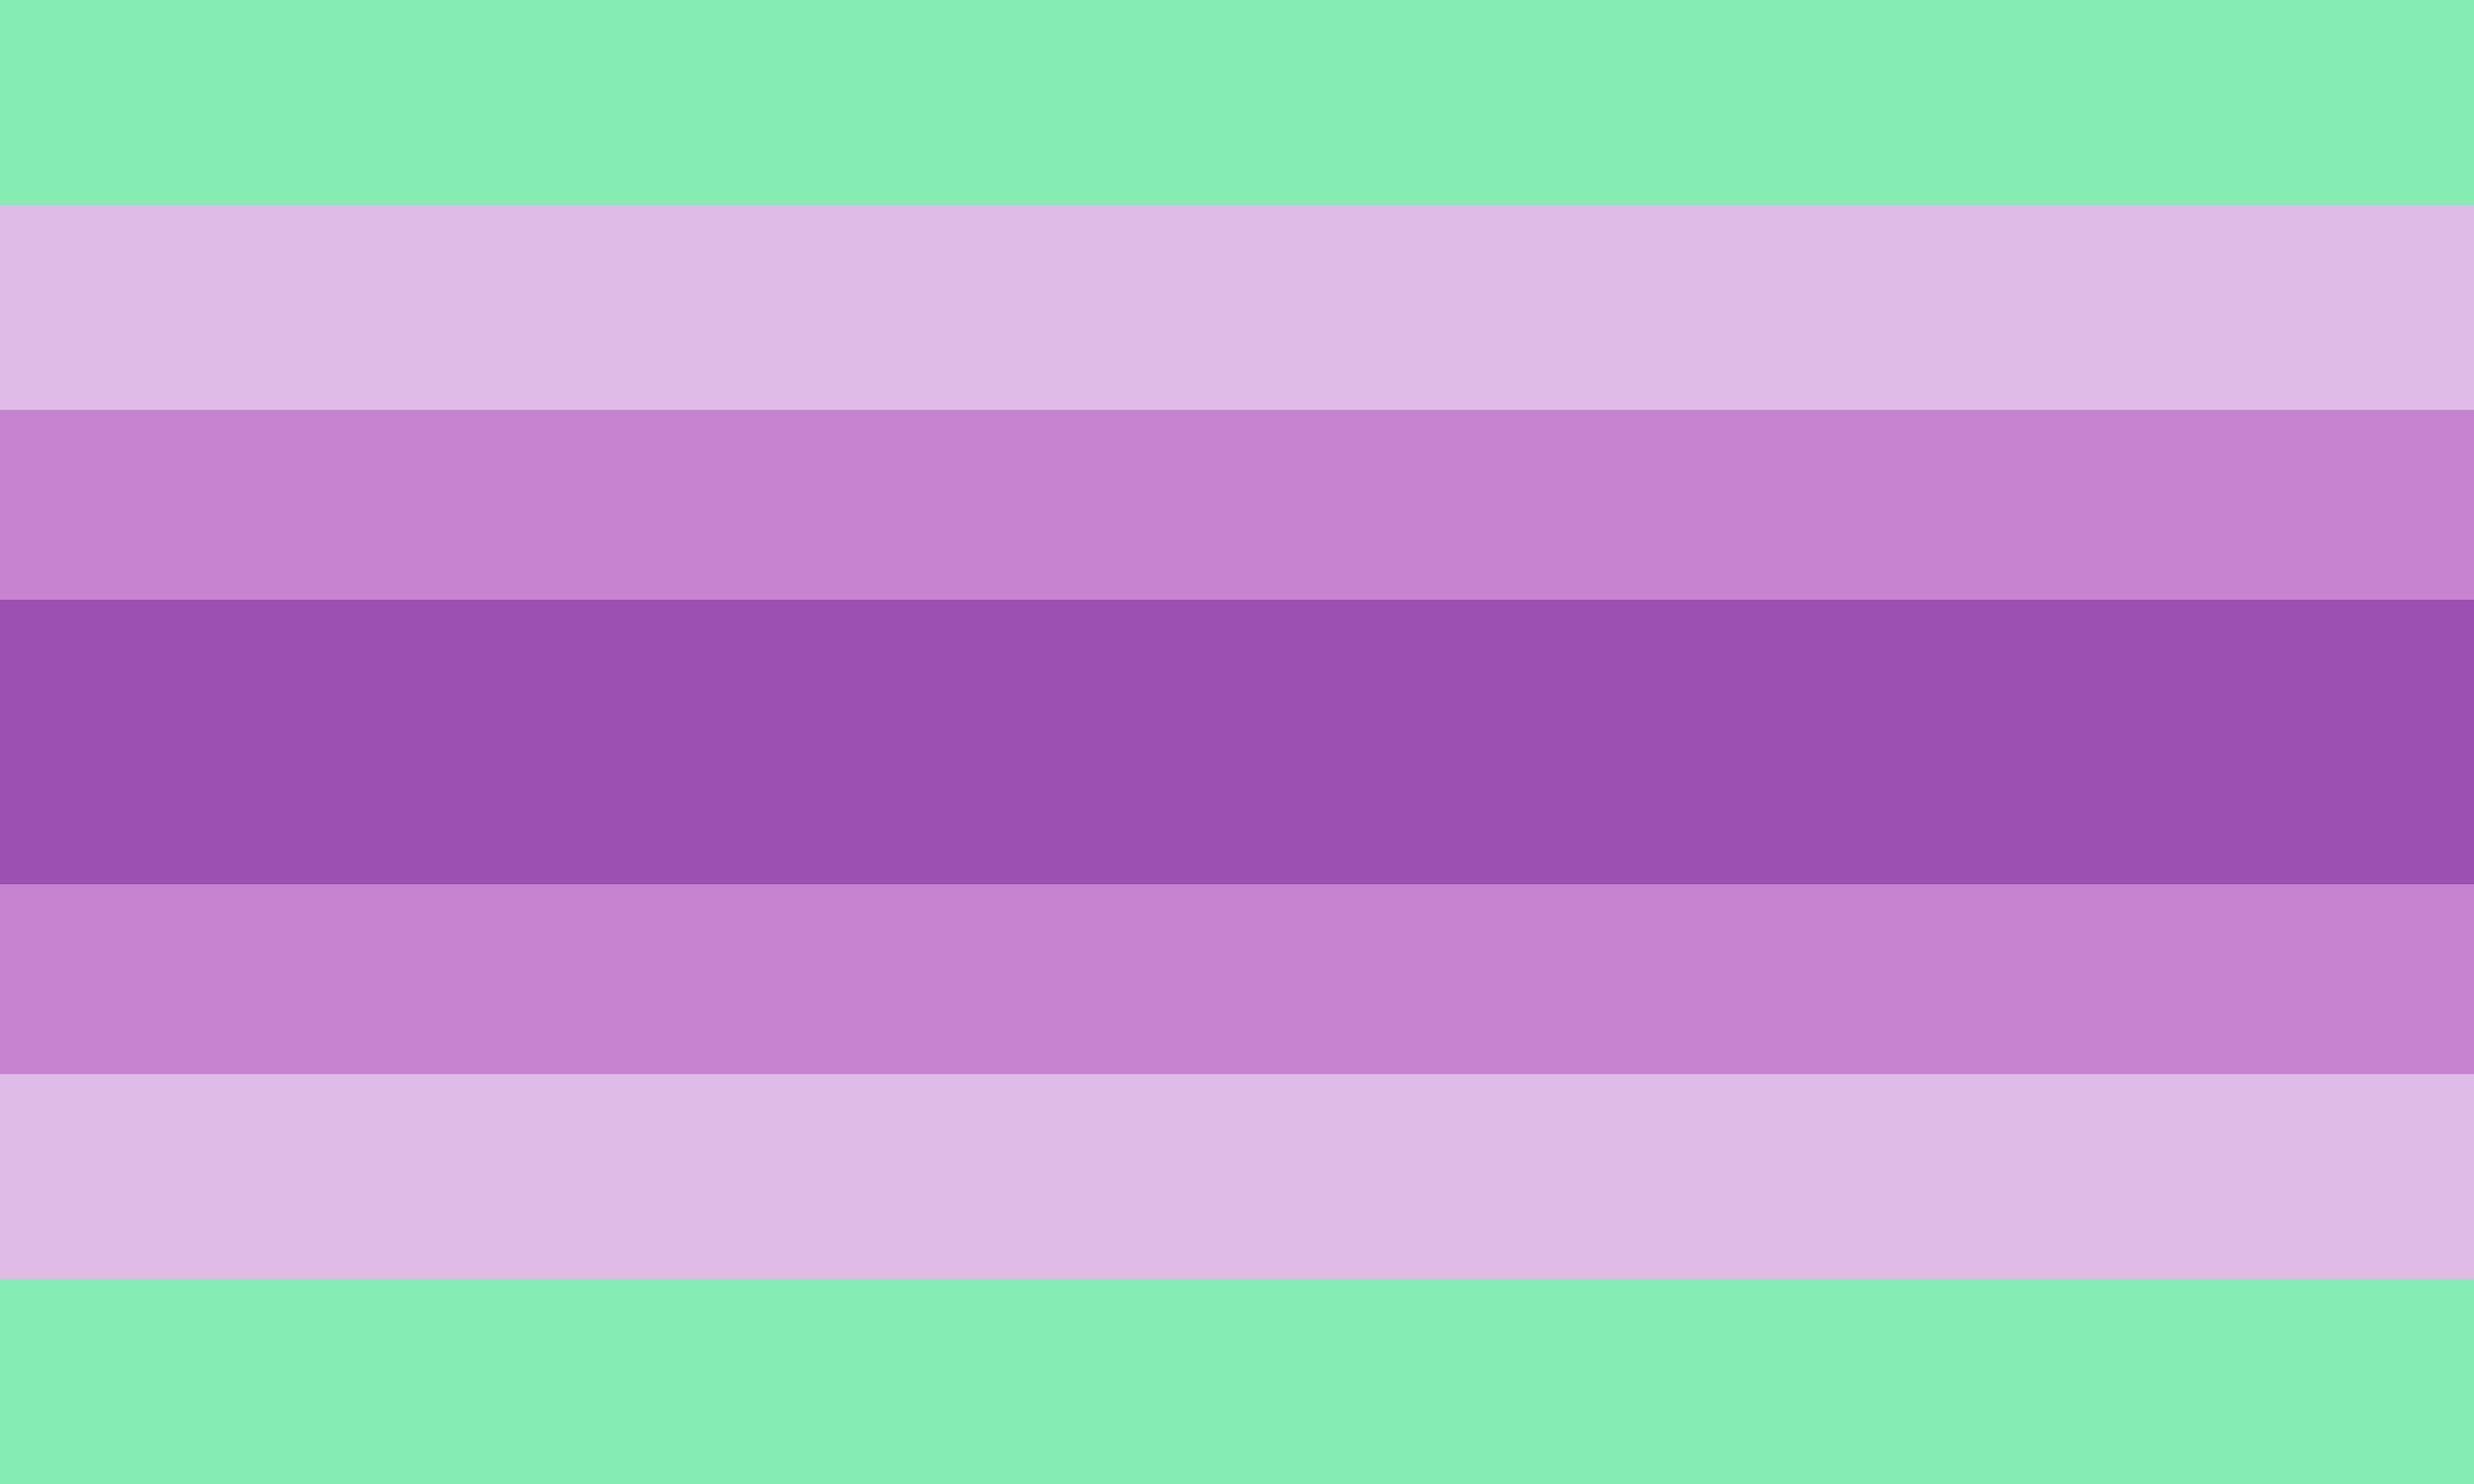 Femgender / Femmegender / Fegender (1)